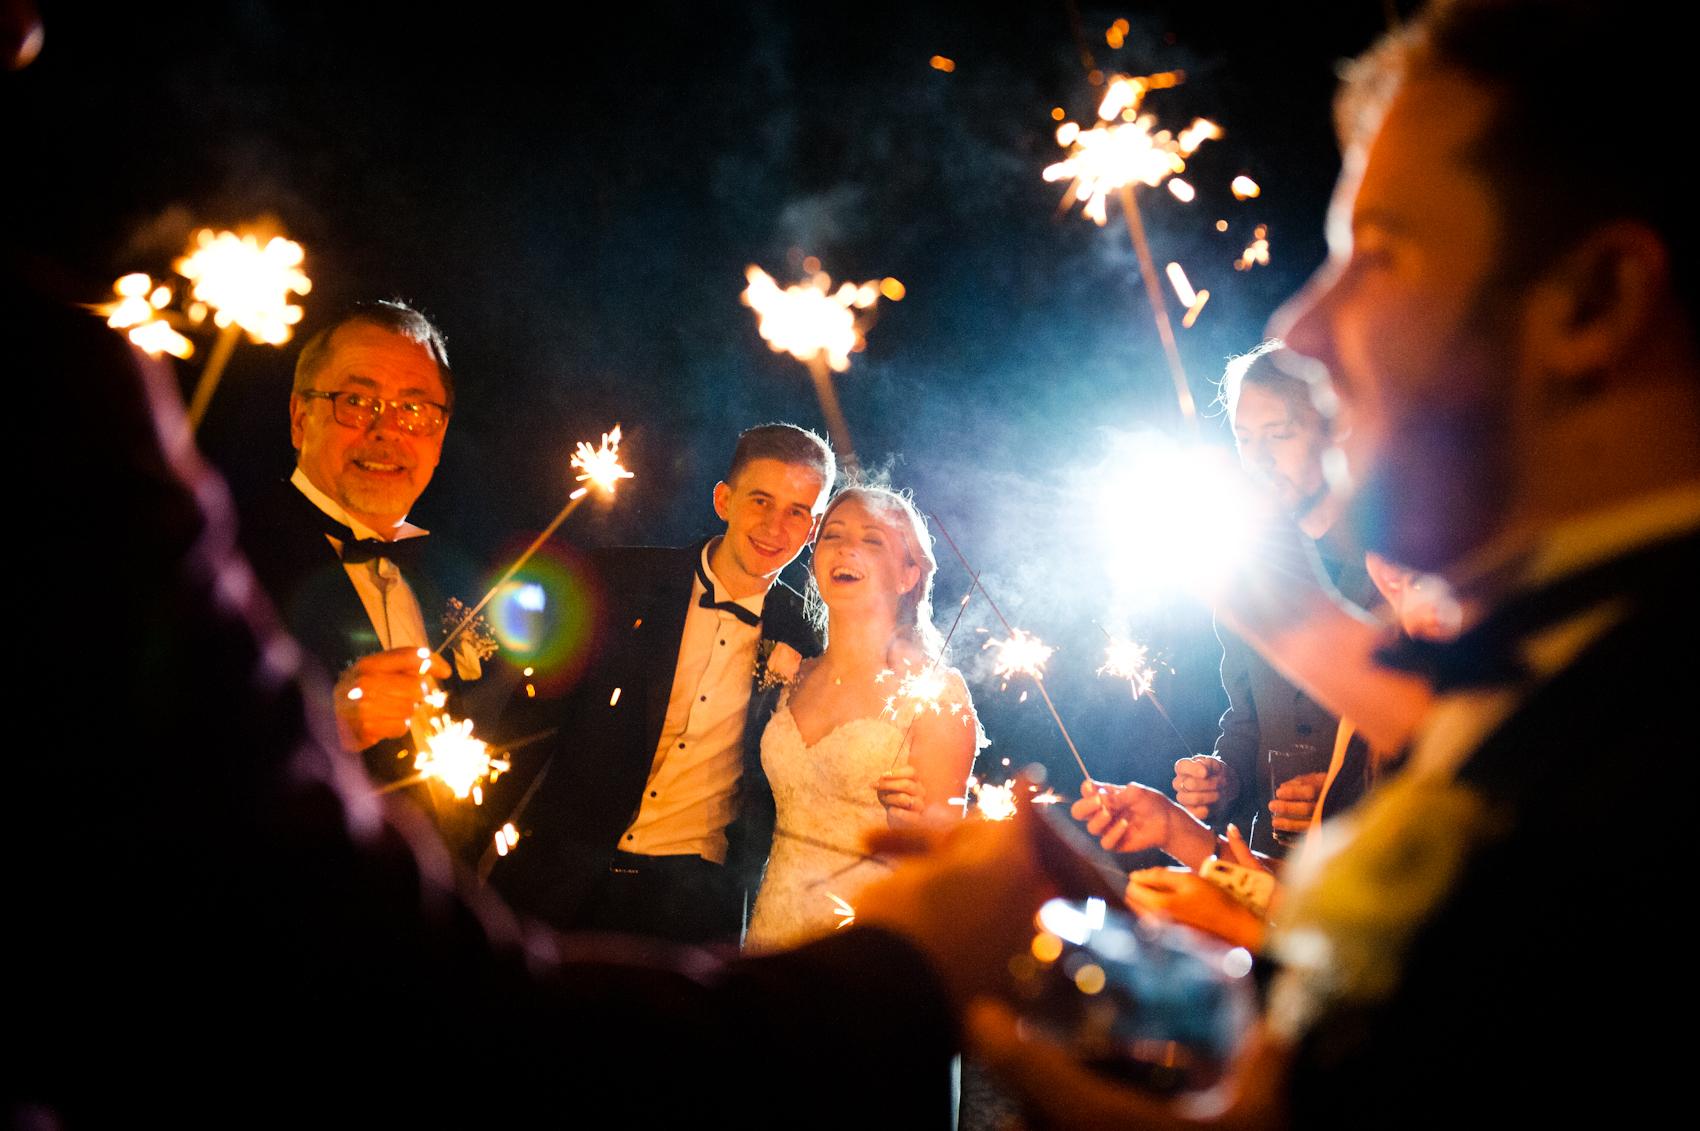 Declan & Emma wedding (26 of 29).jpg